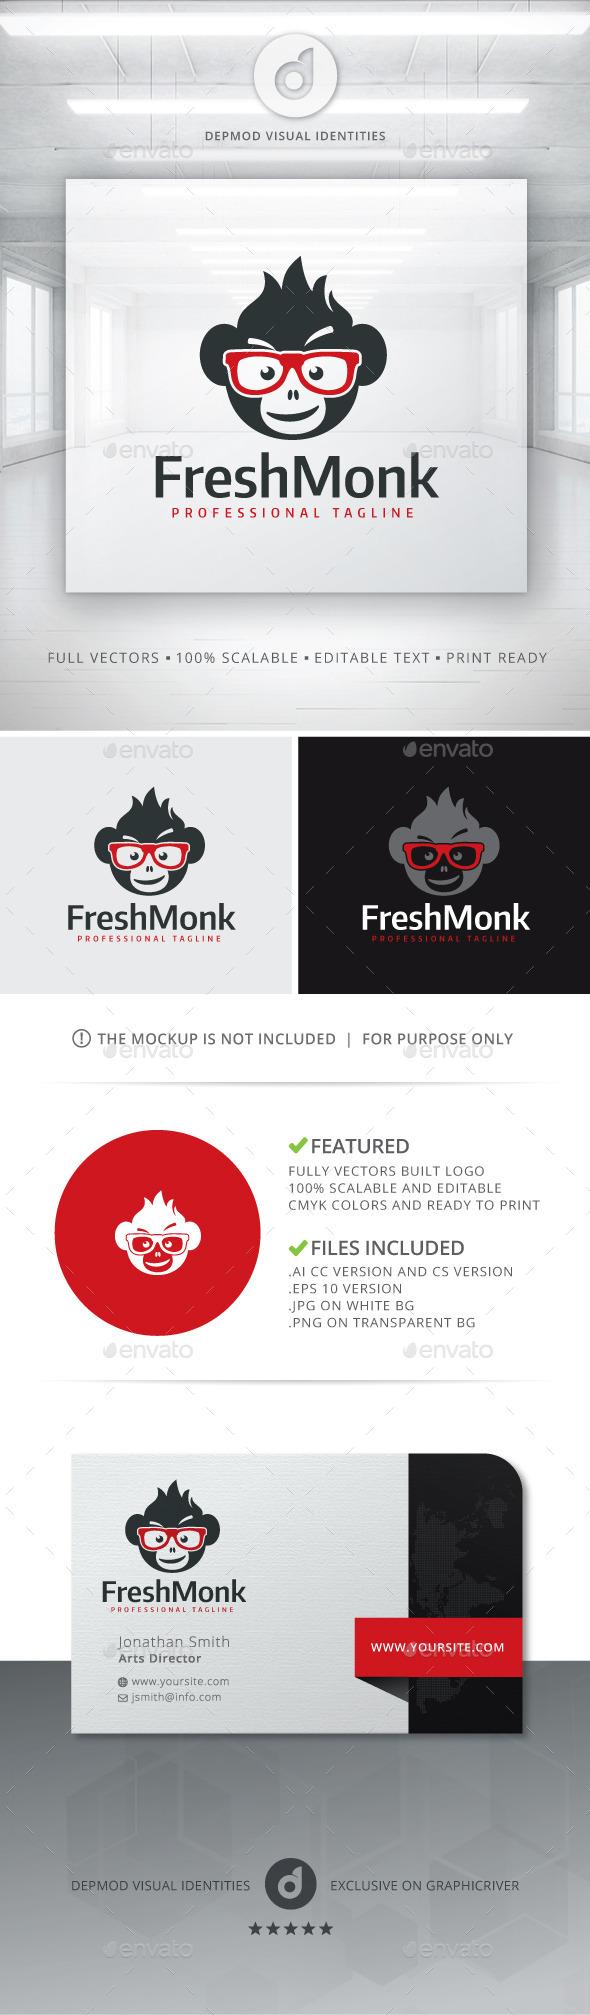 Fresh Monk Logo